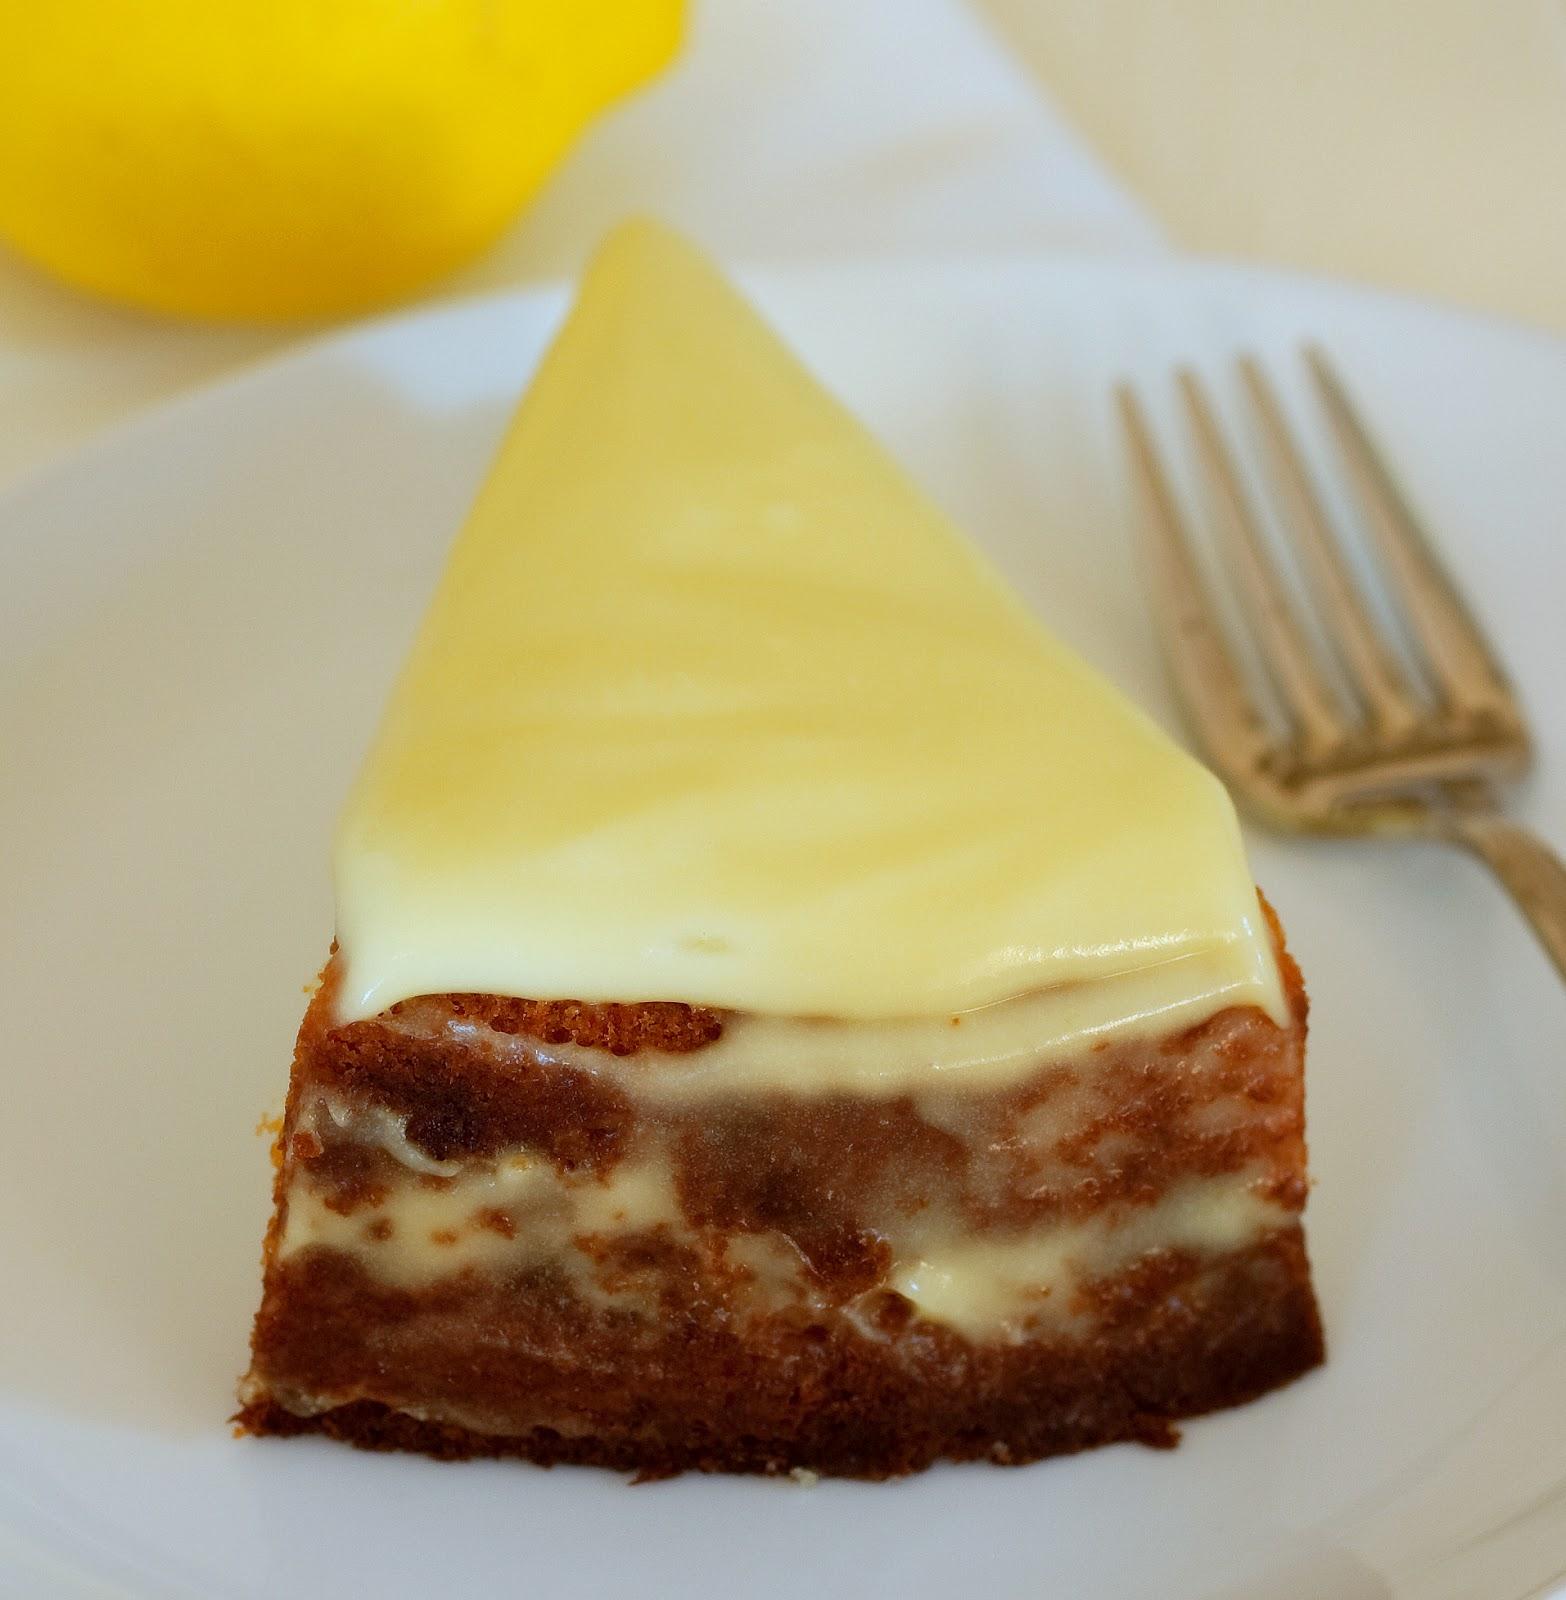 Tish Boyle Sweet Dreams Vintage Cakes